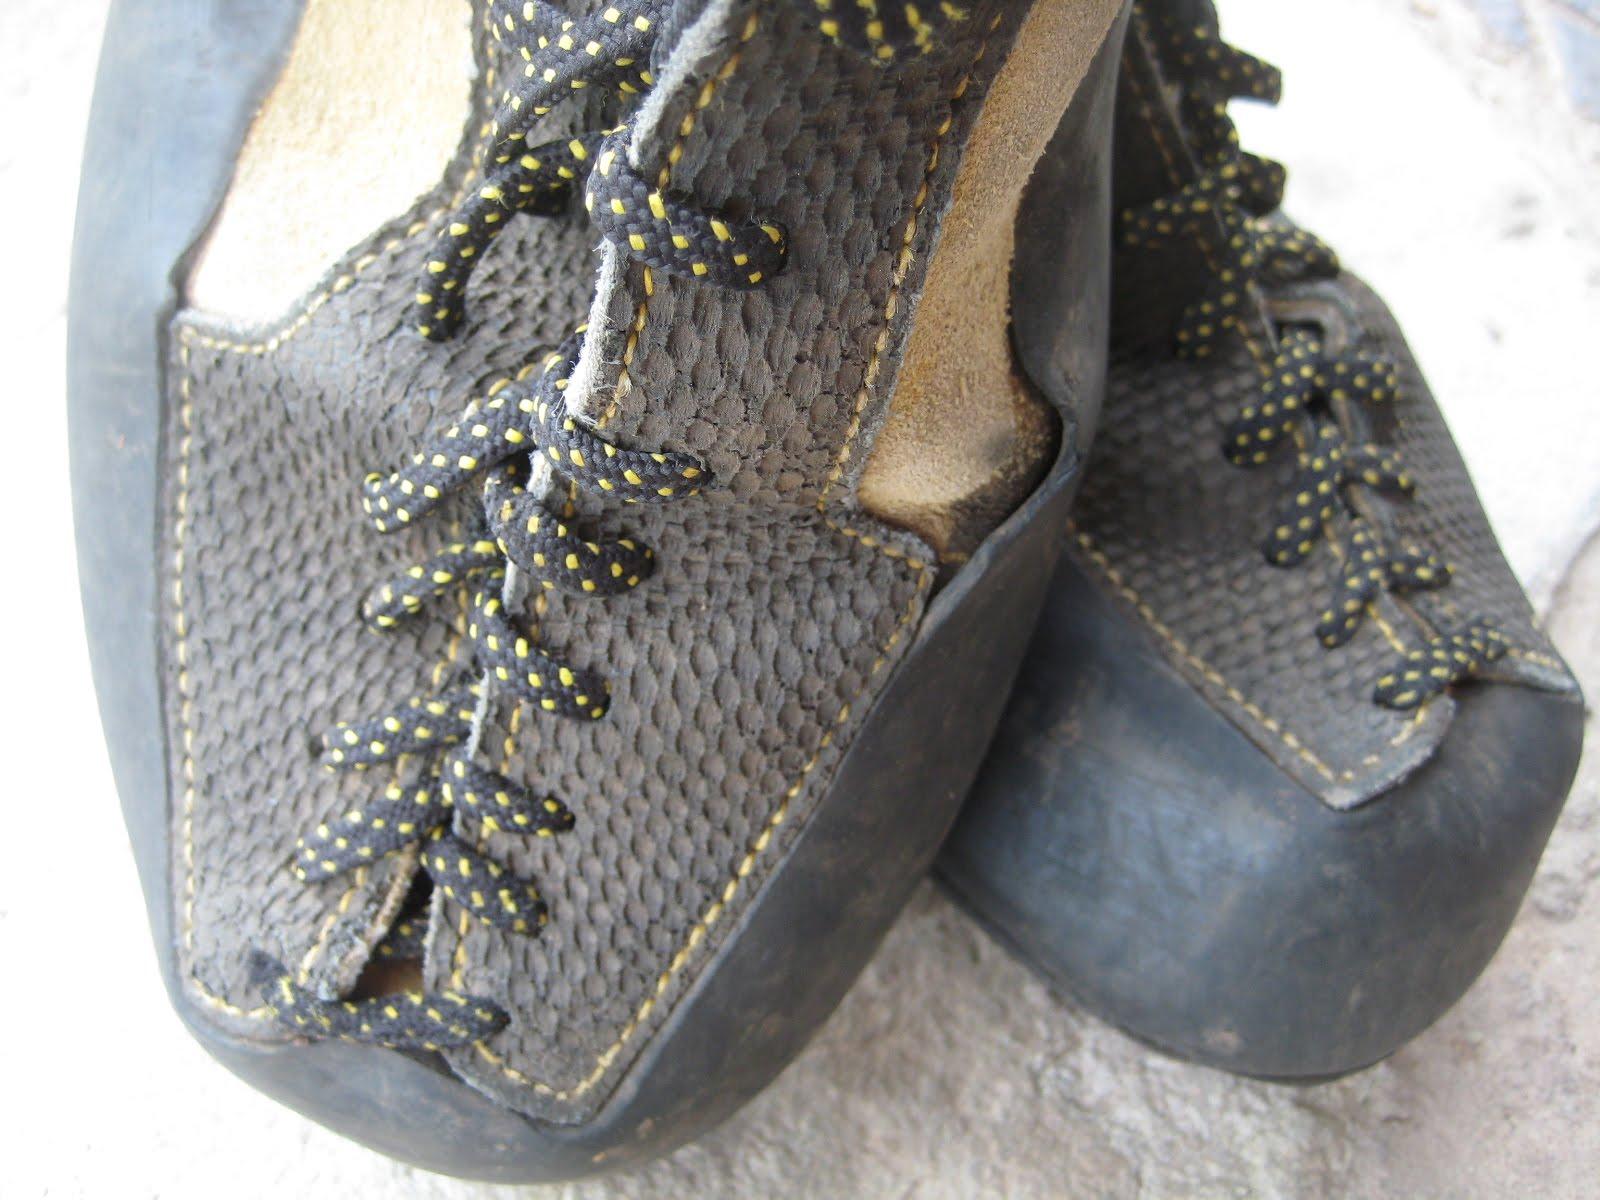 Do You Wear Socks With Rock Climbing Shoes